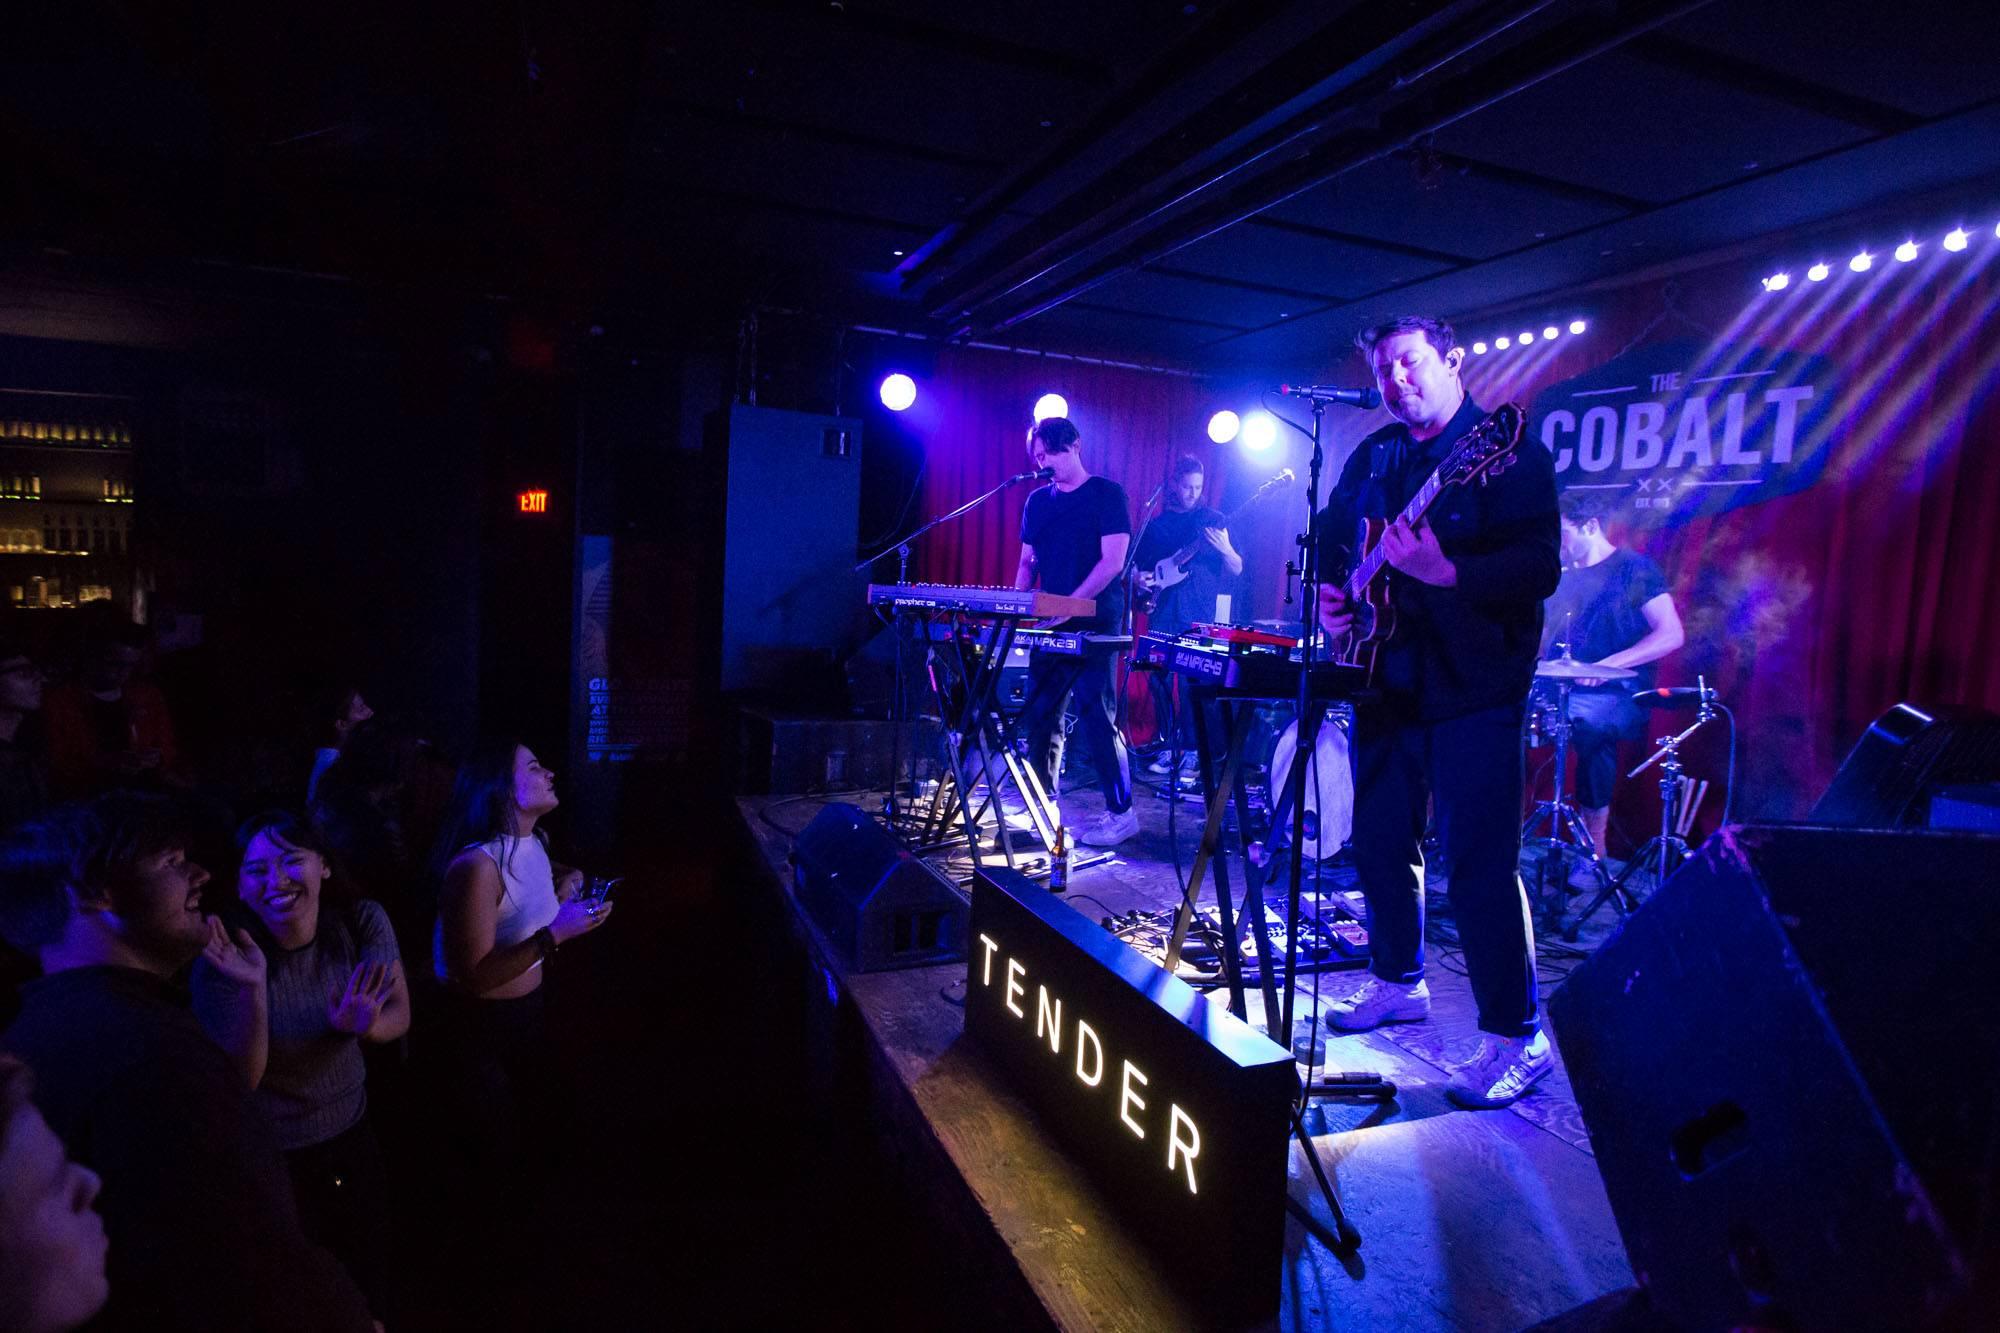 Tender at the Cobalt Cabaret, Vancouver, Sept 17 2017. Kirk Chantraine photo.